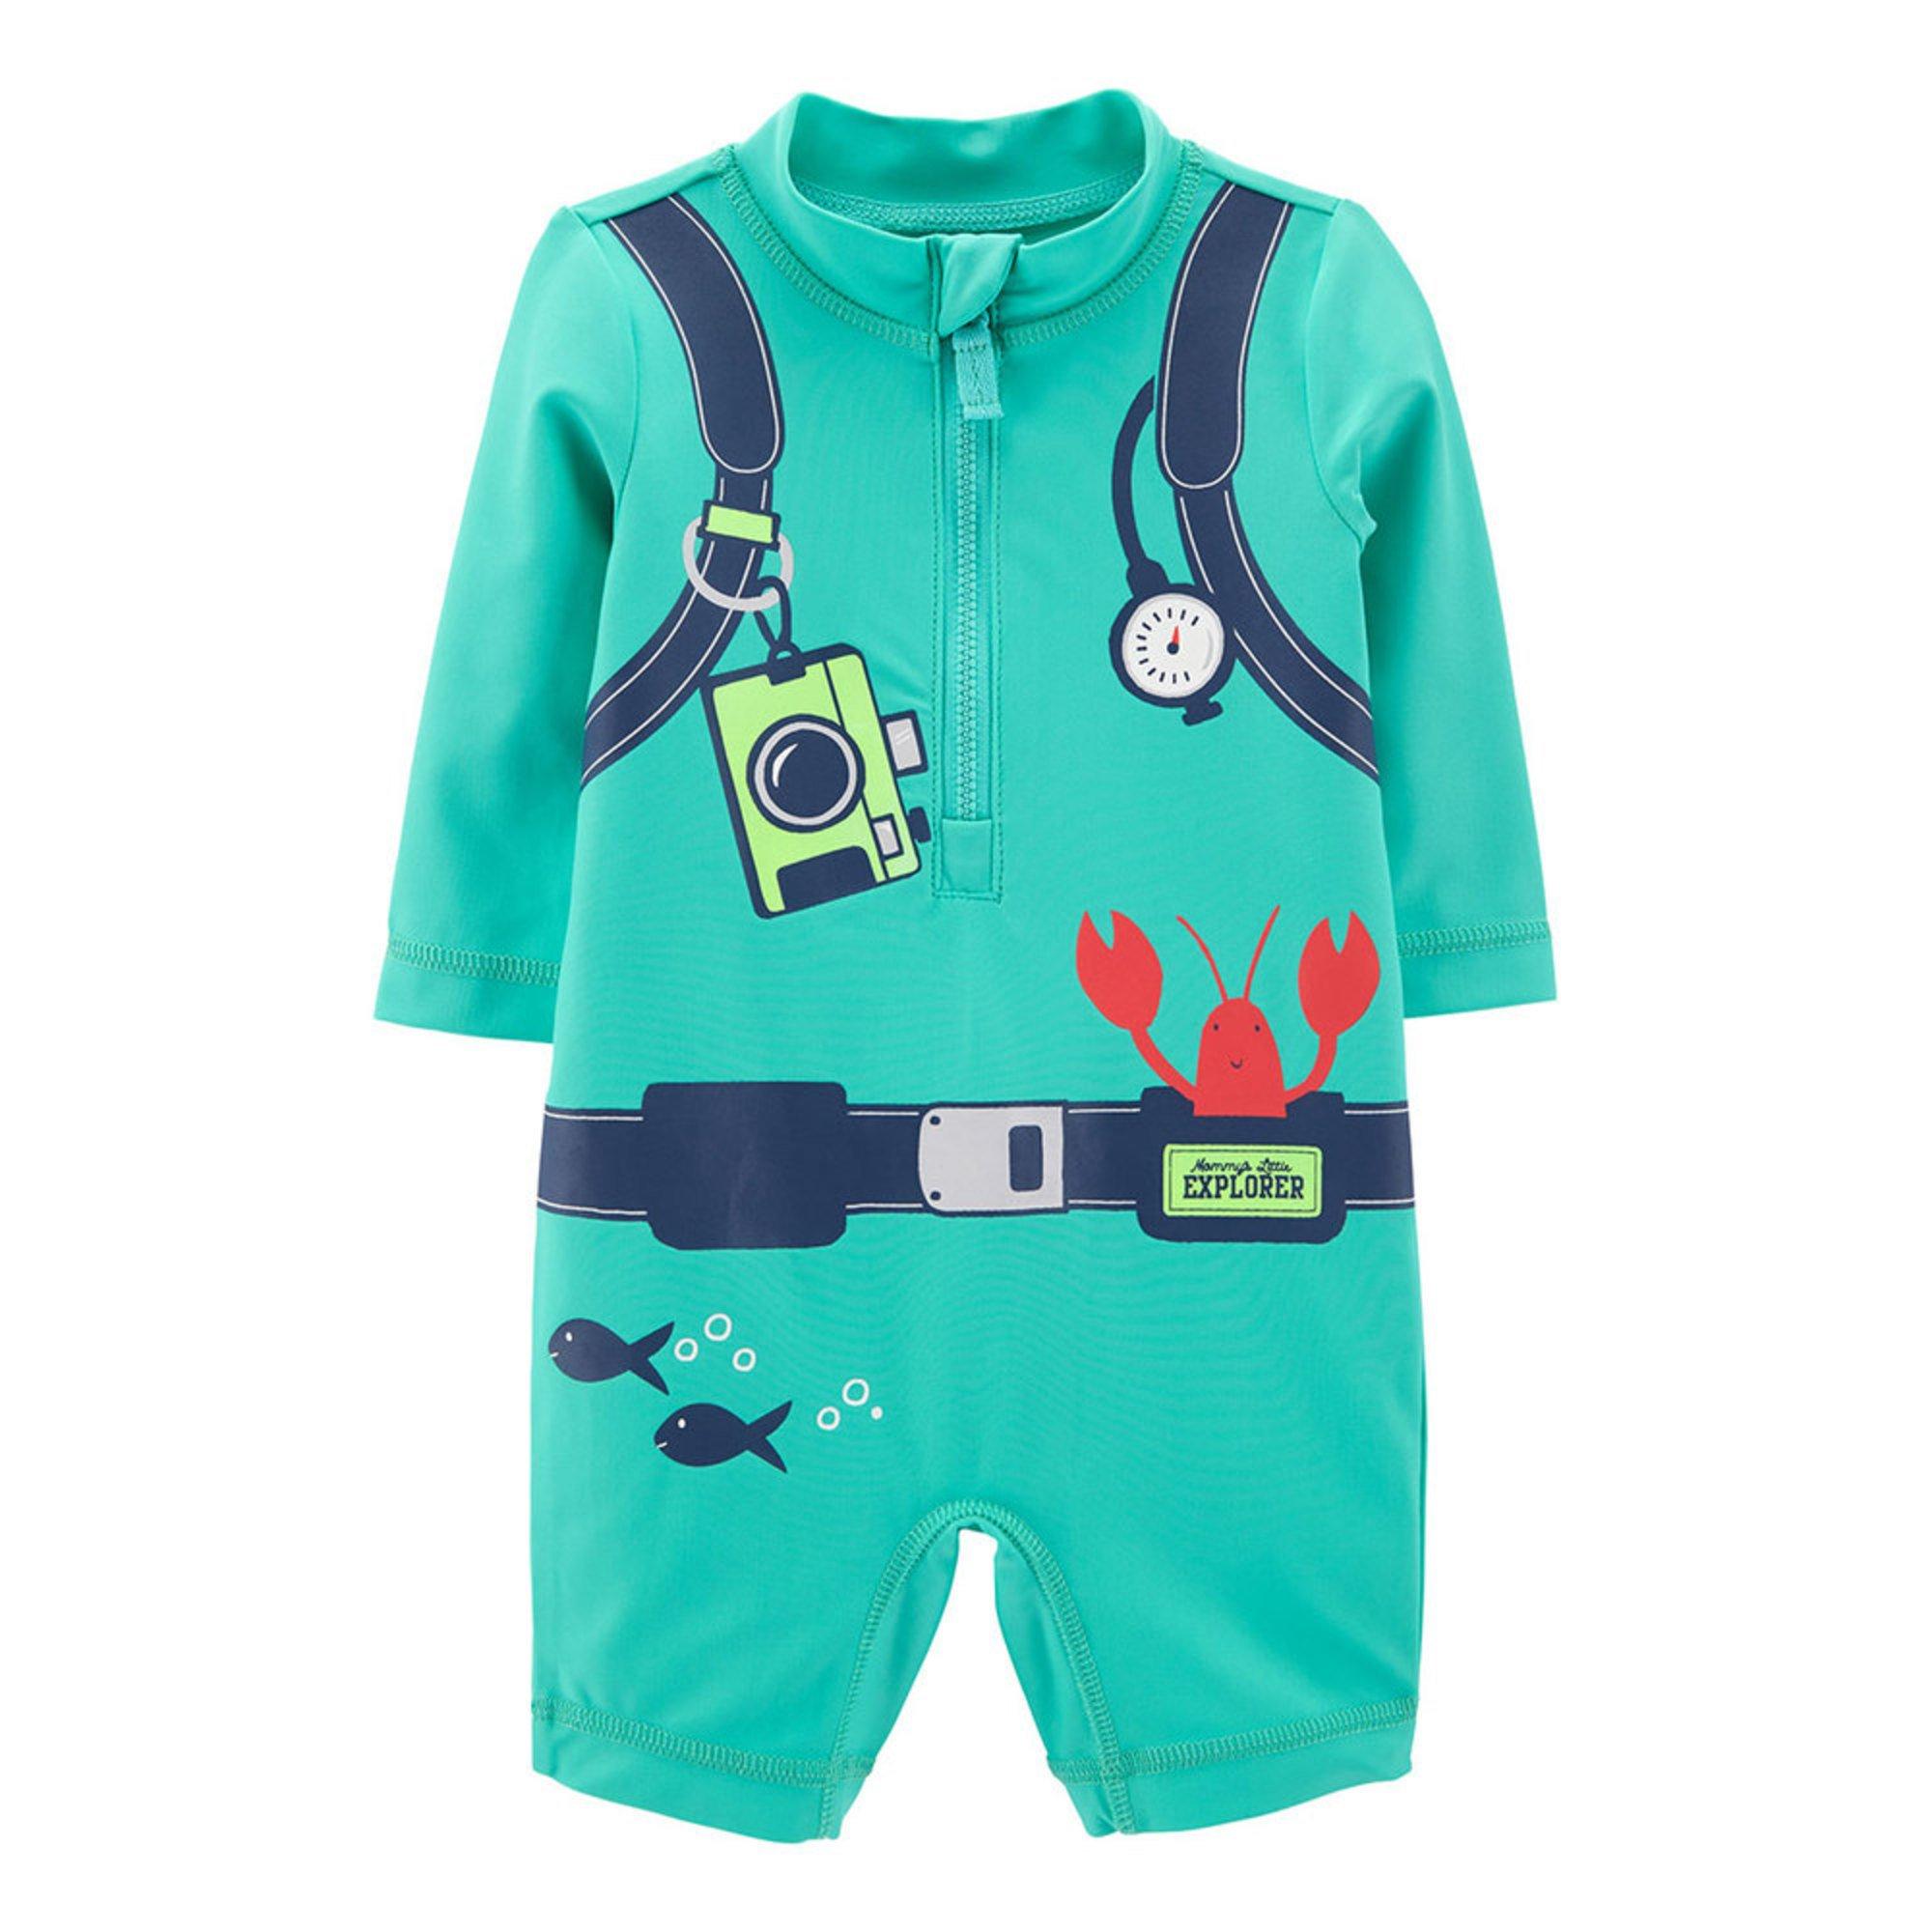 8805089a650ac Carter's Baby Boys' Scuba Rashguard | Baby Boys' Swimwear | Apparel ...